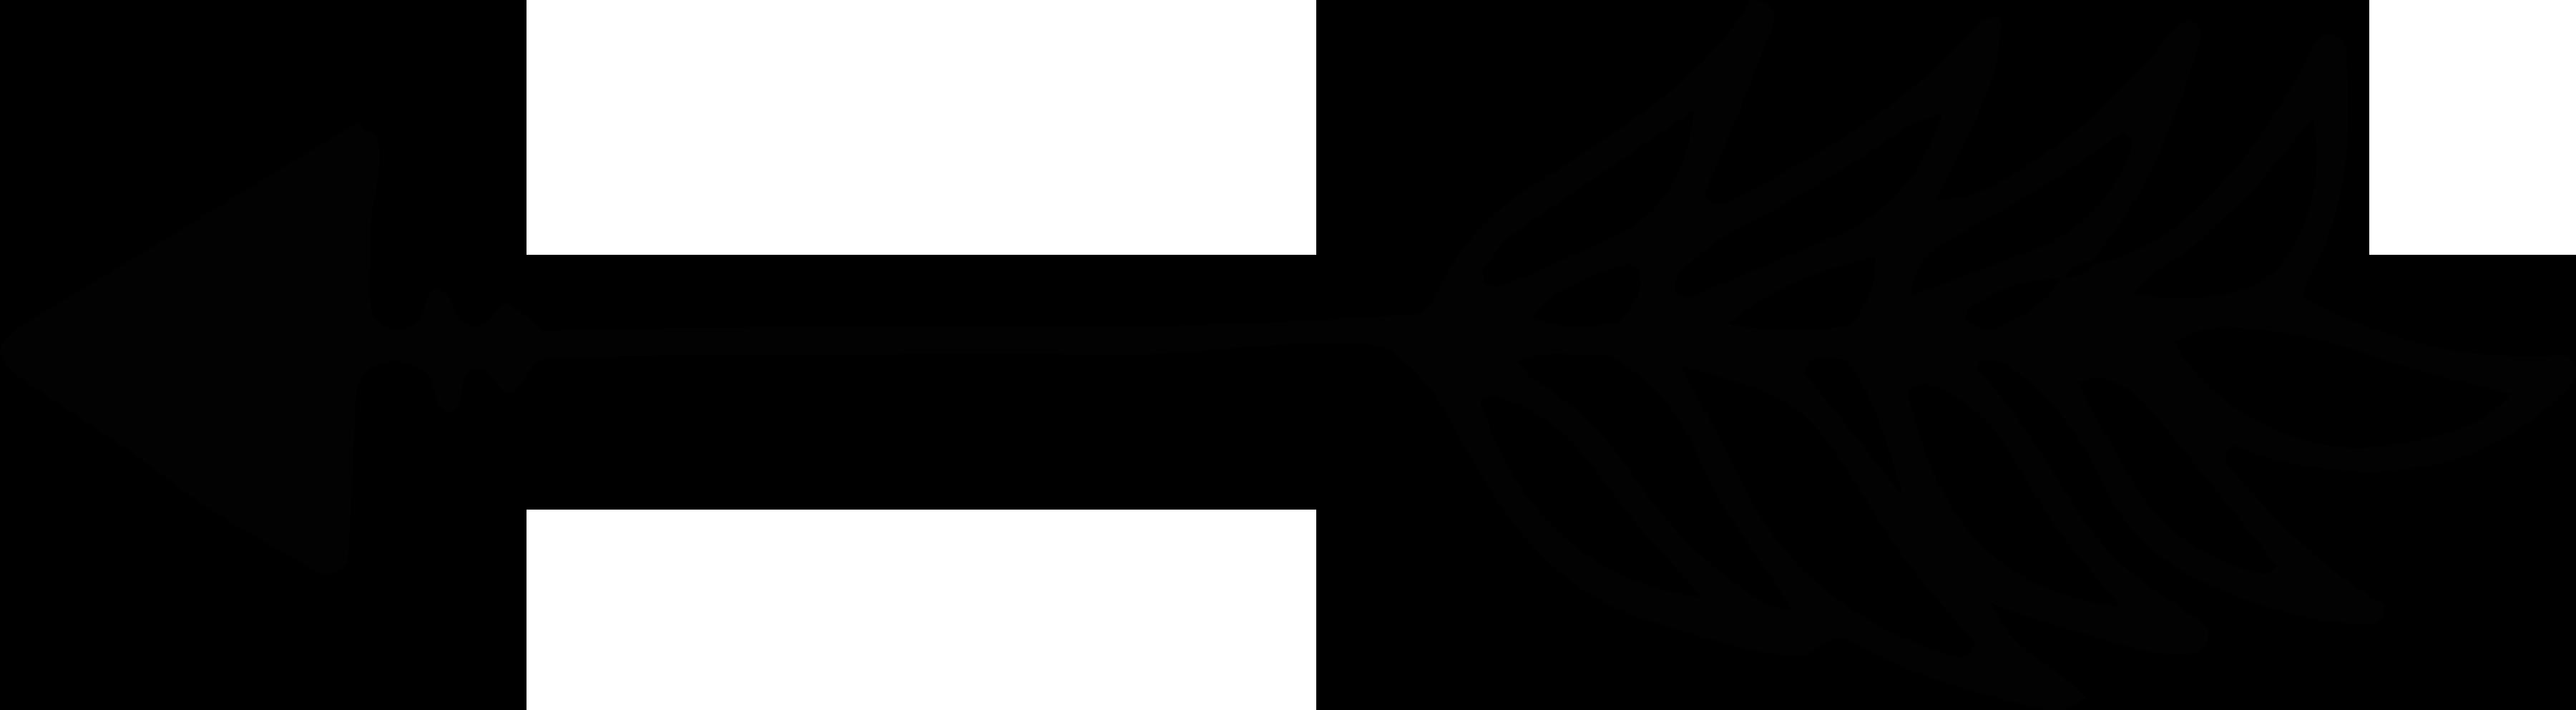 Arrows clipart filigree. Garnish png pinterest